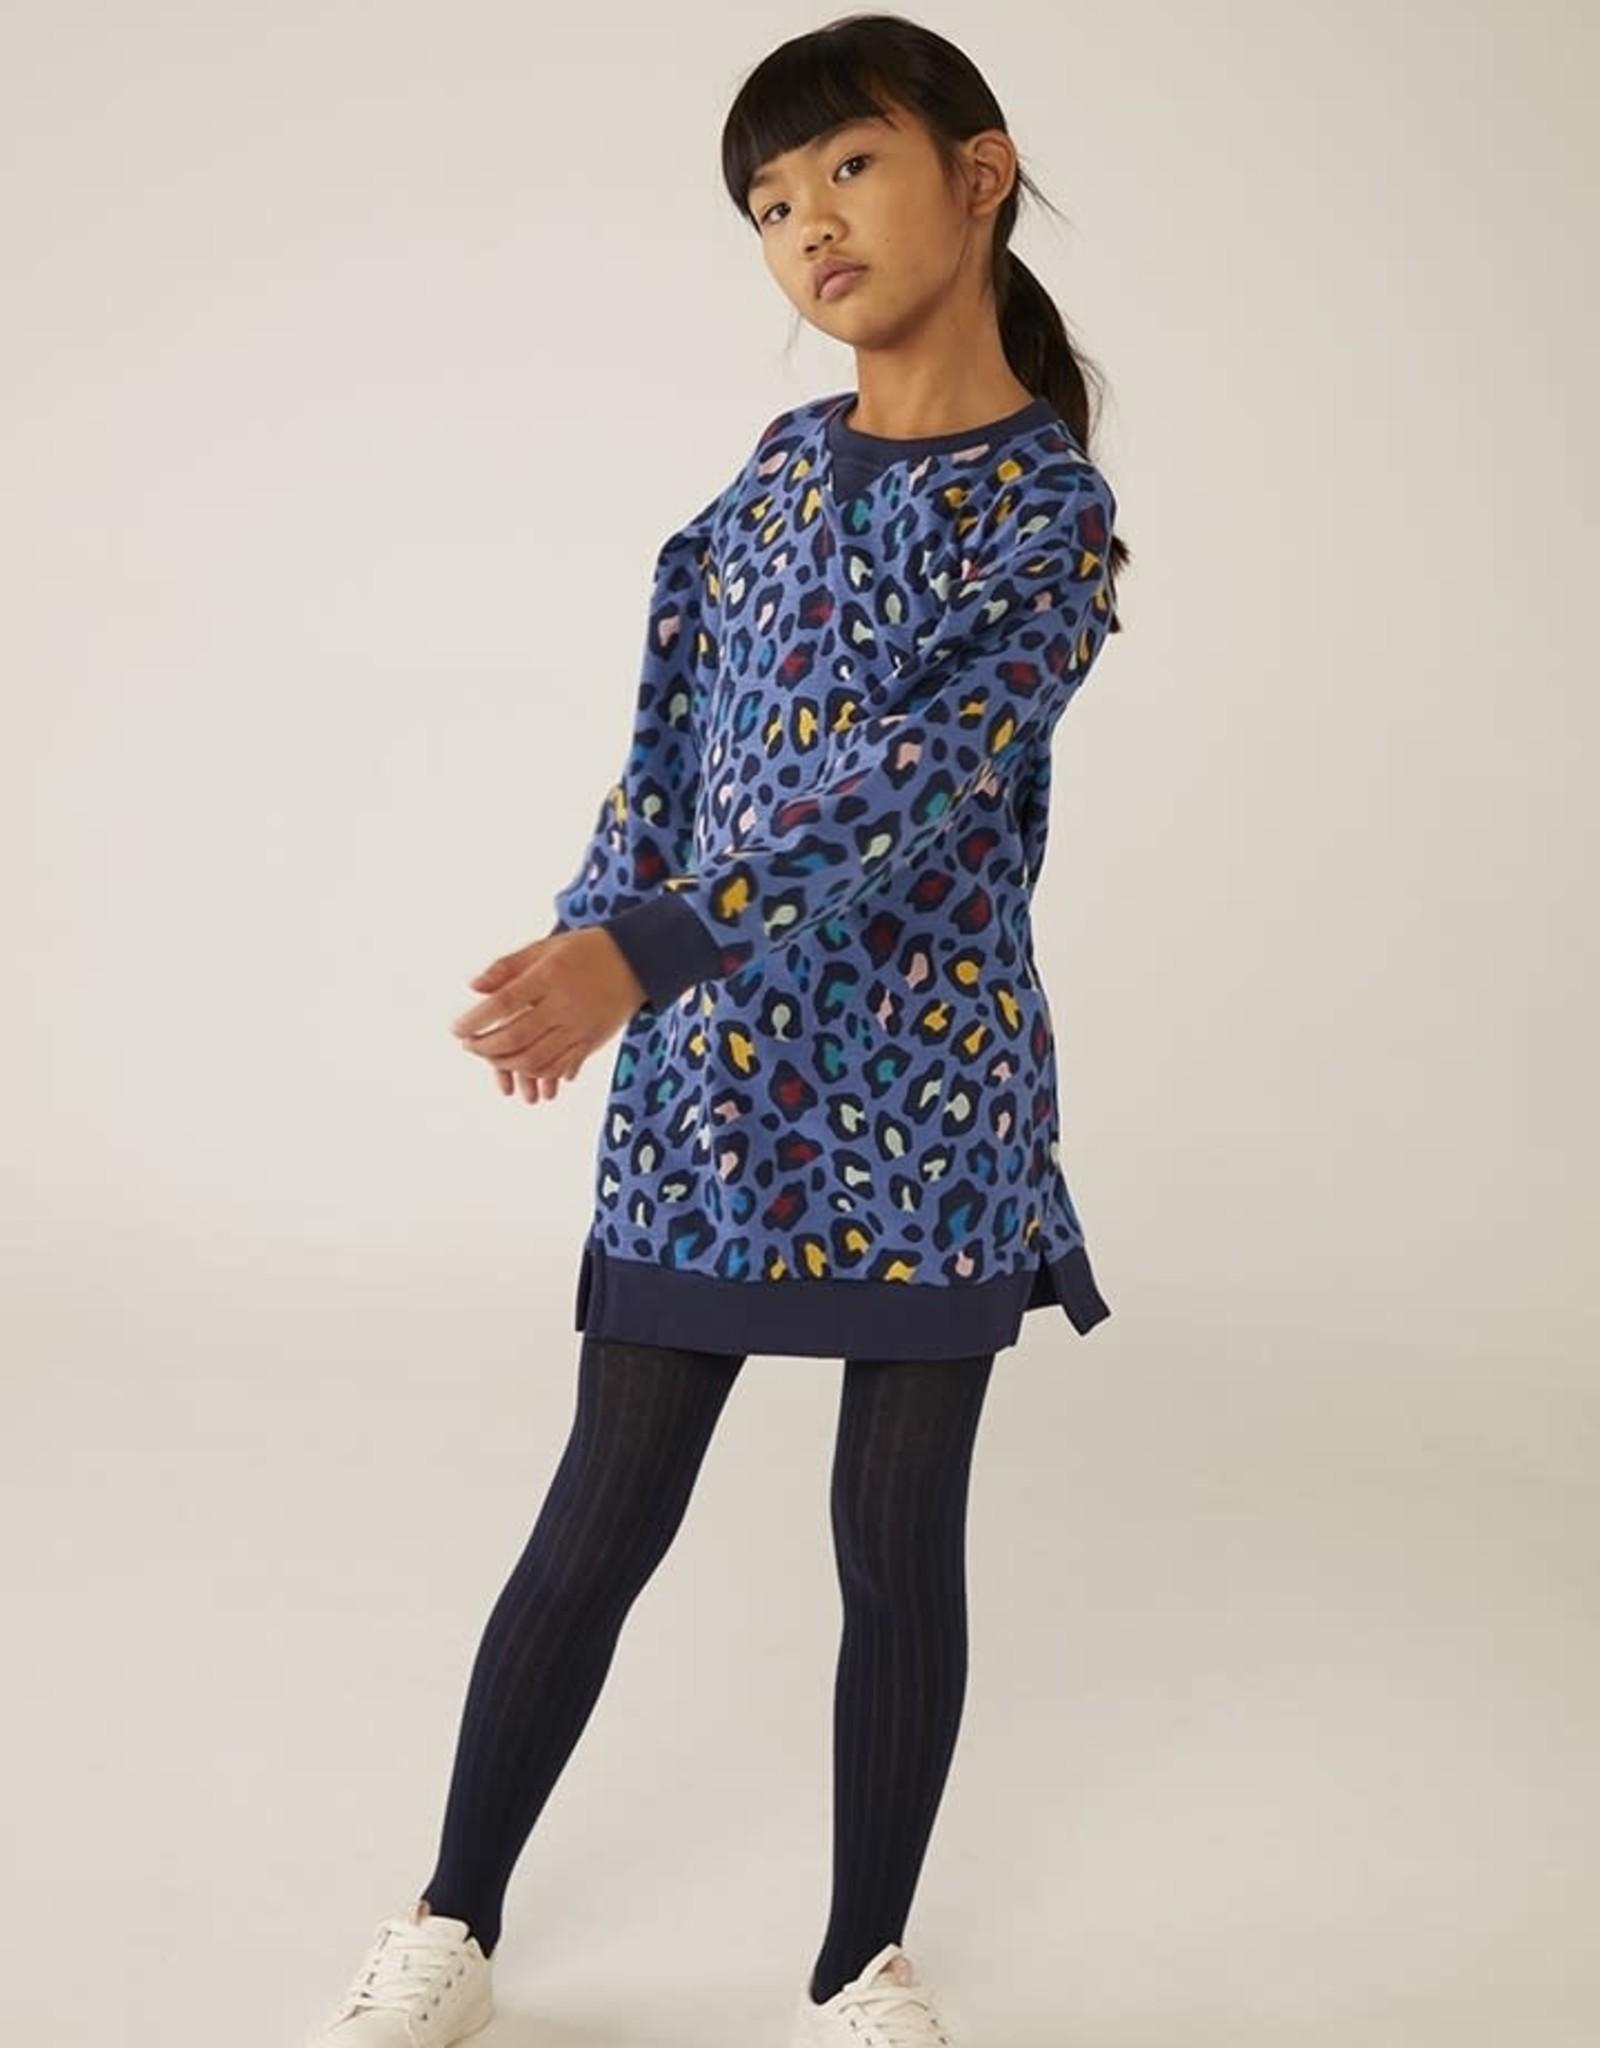 Boboli Fleece Dress - Blue Leopard Print